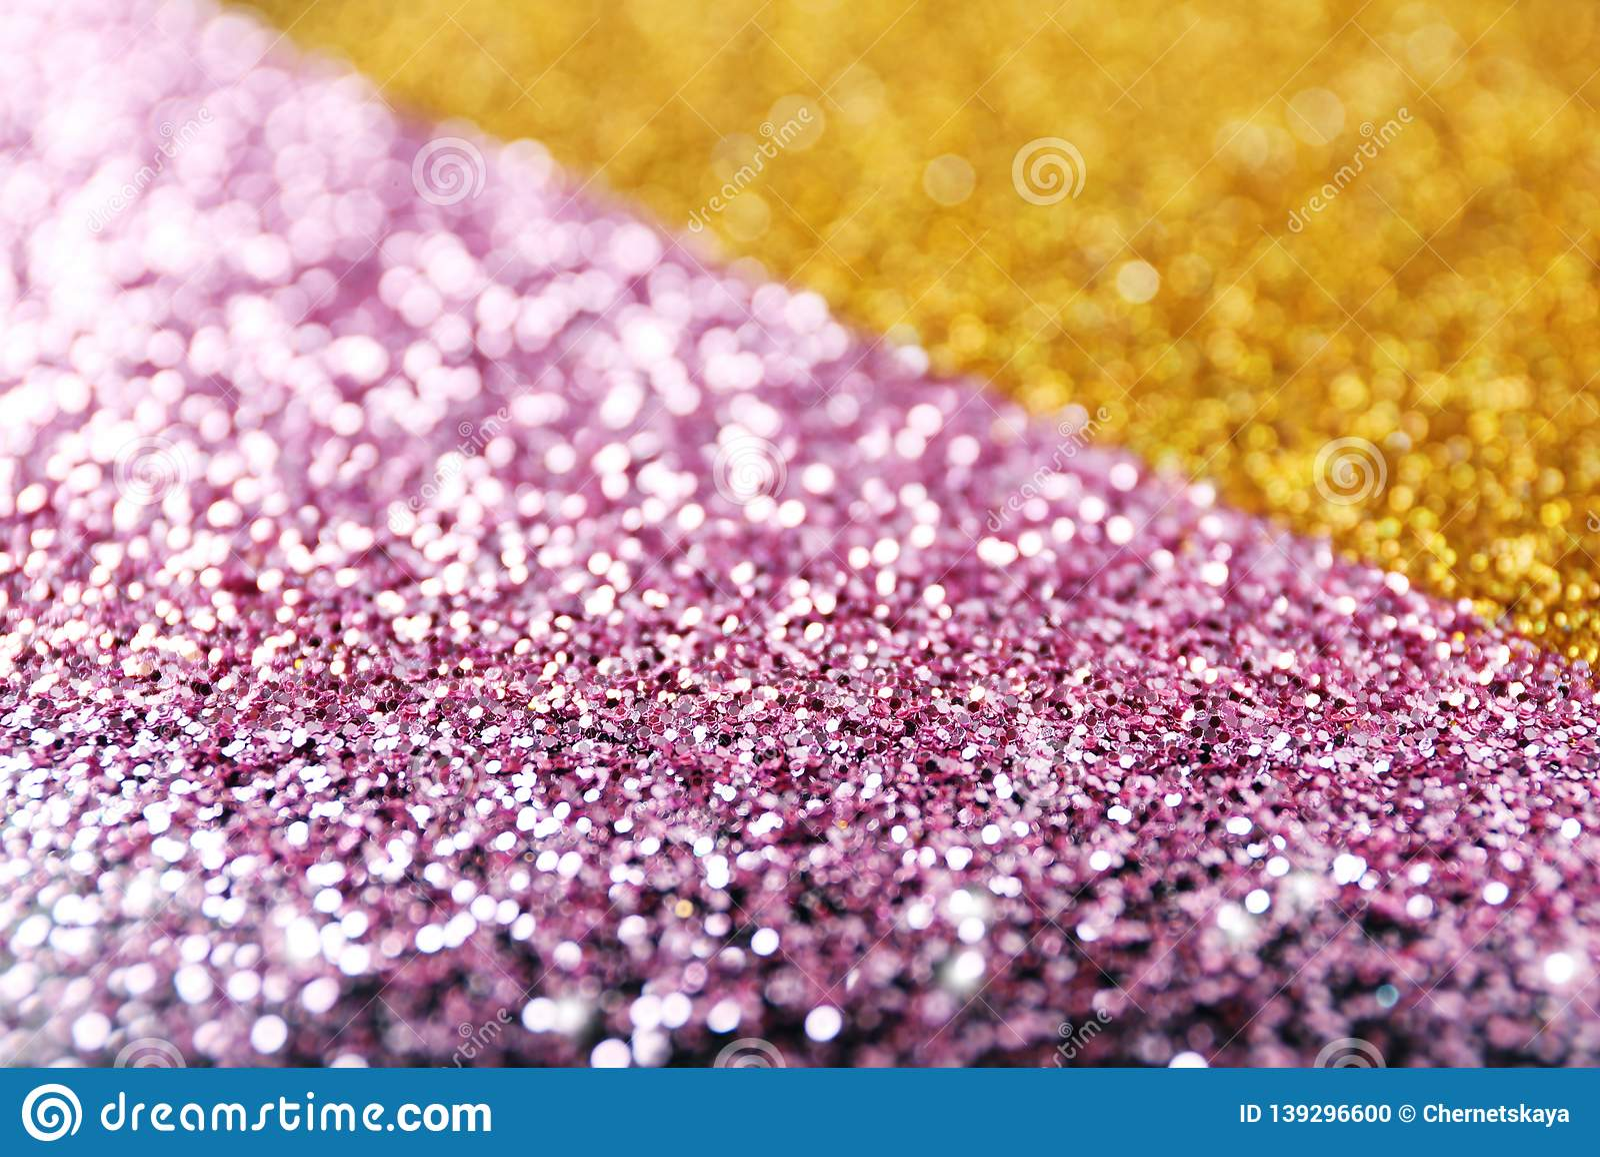 Gold And Rose Glitter As Background Stock Illustration - Illustration of design, gold: 139296600